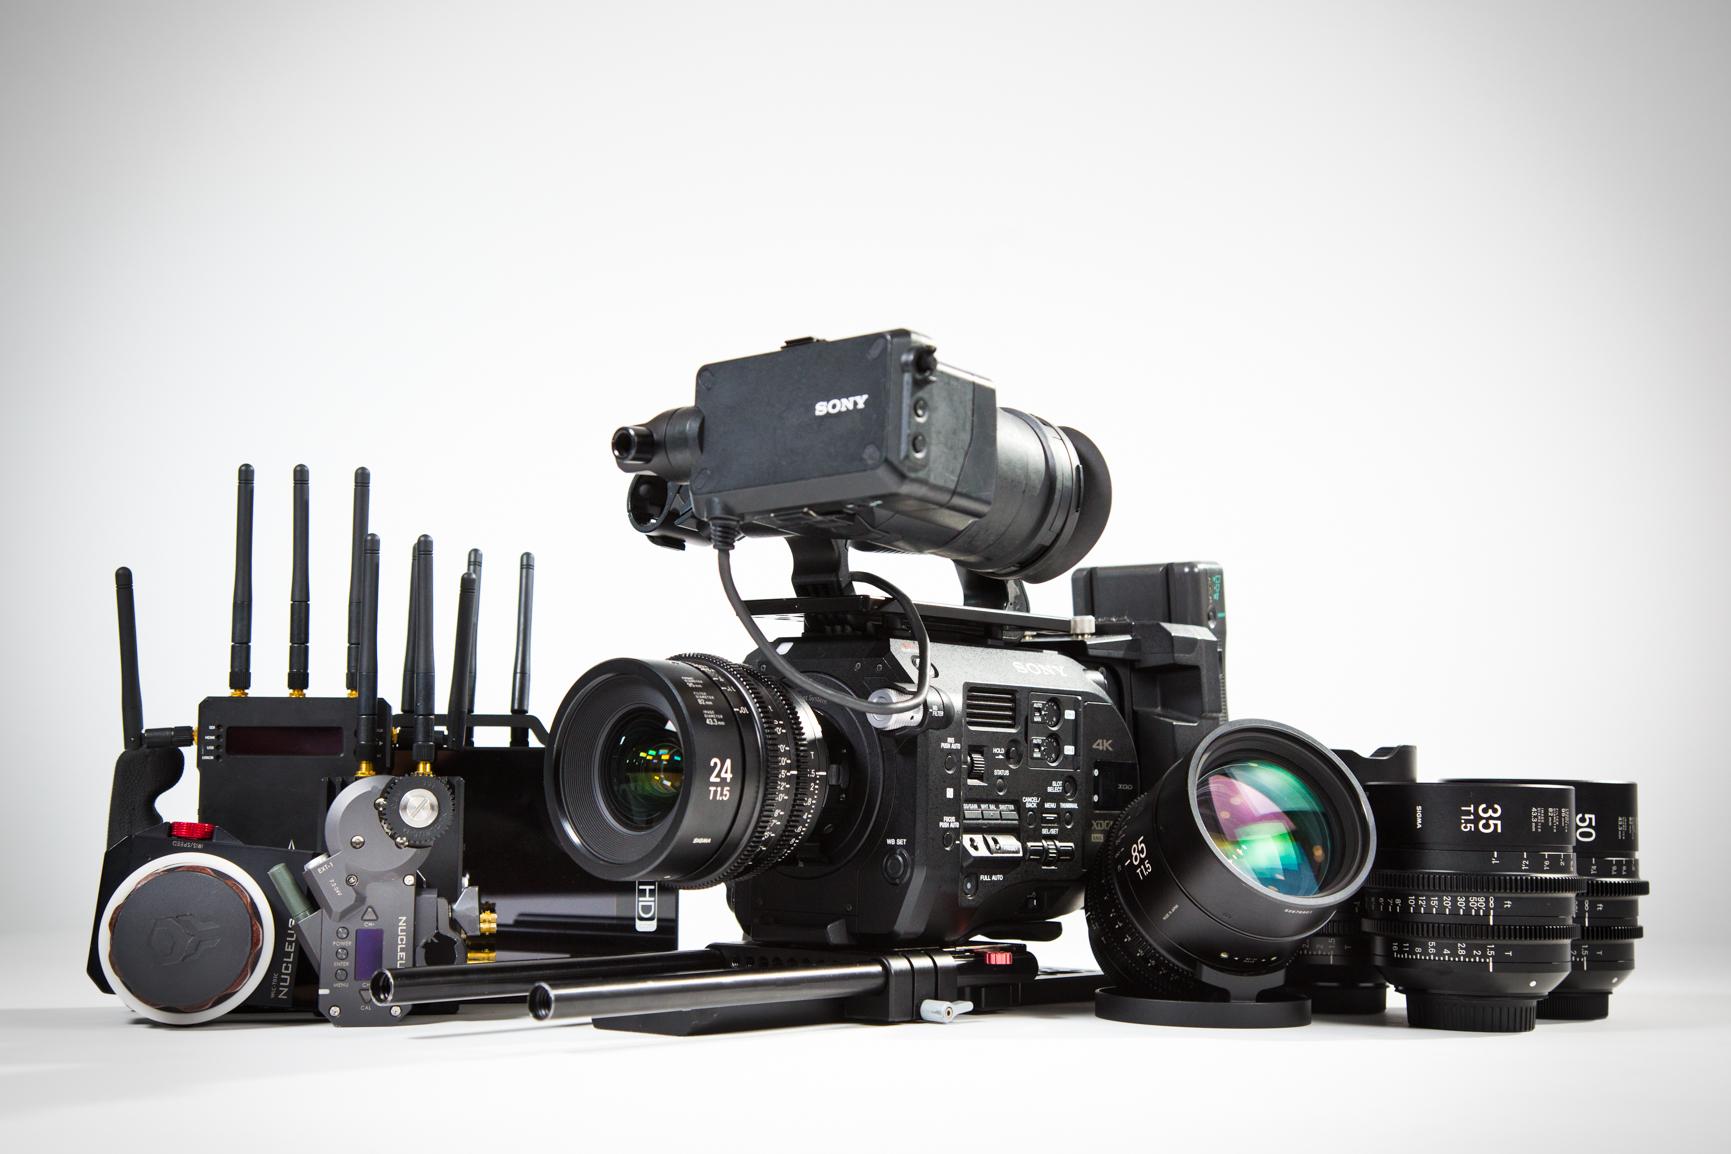 Sony Fs7, Sigma Primes, Tilta Nucleus M, SmallHD 703 Bolt, Teradek 600